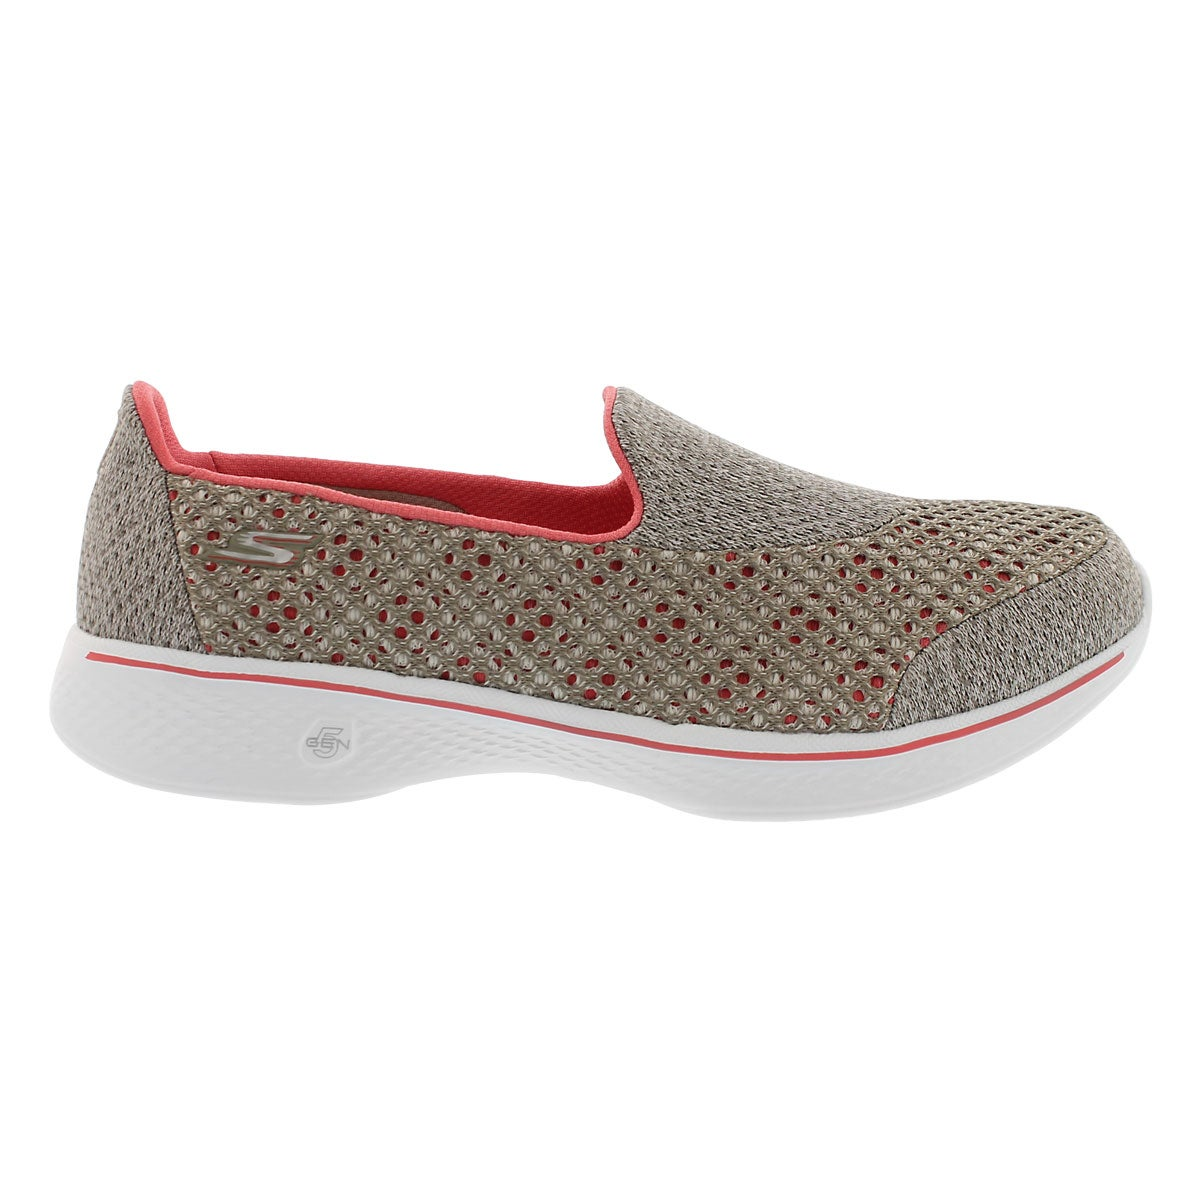 Lds GO Walk 4 Kindle taupe walking shoe